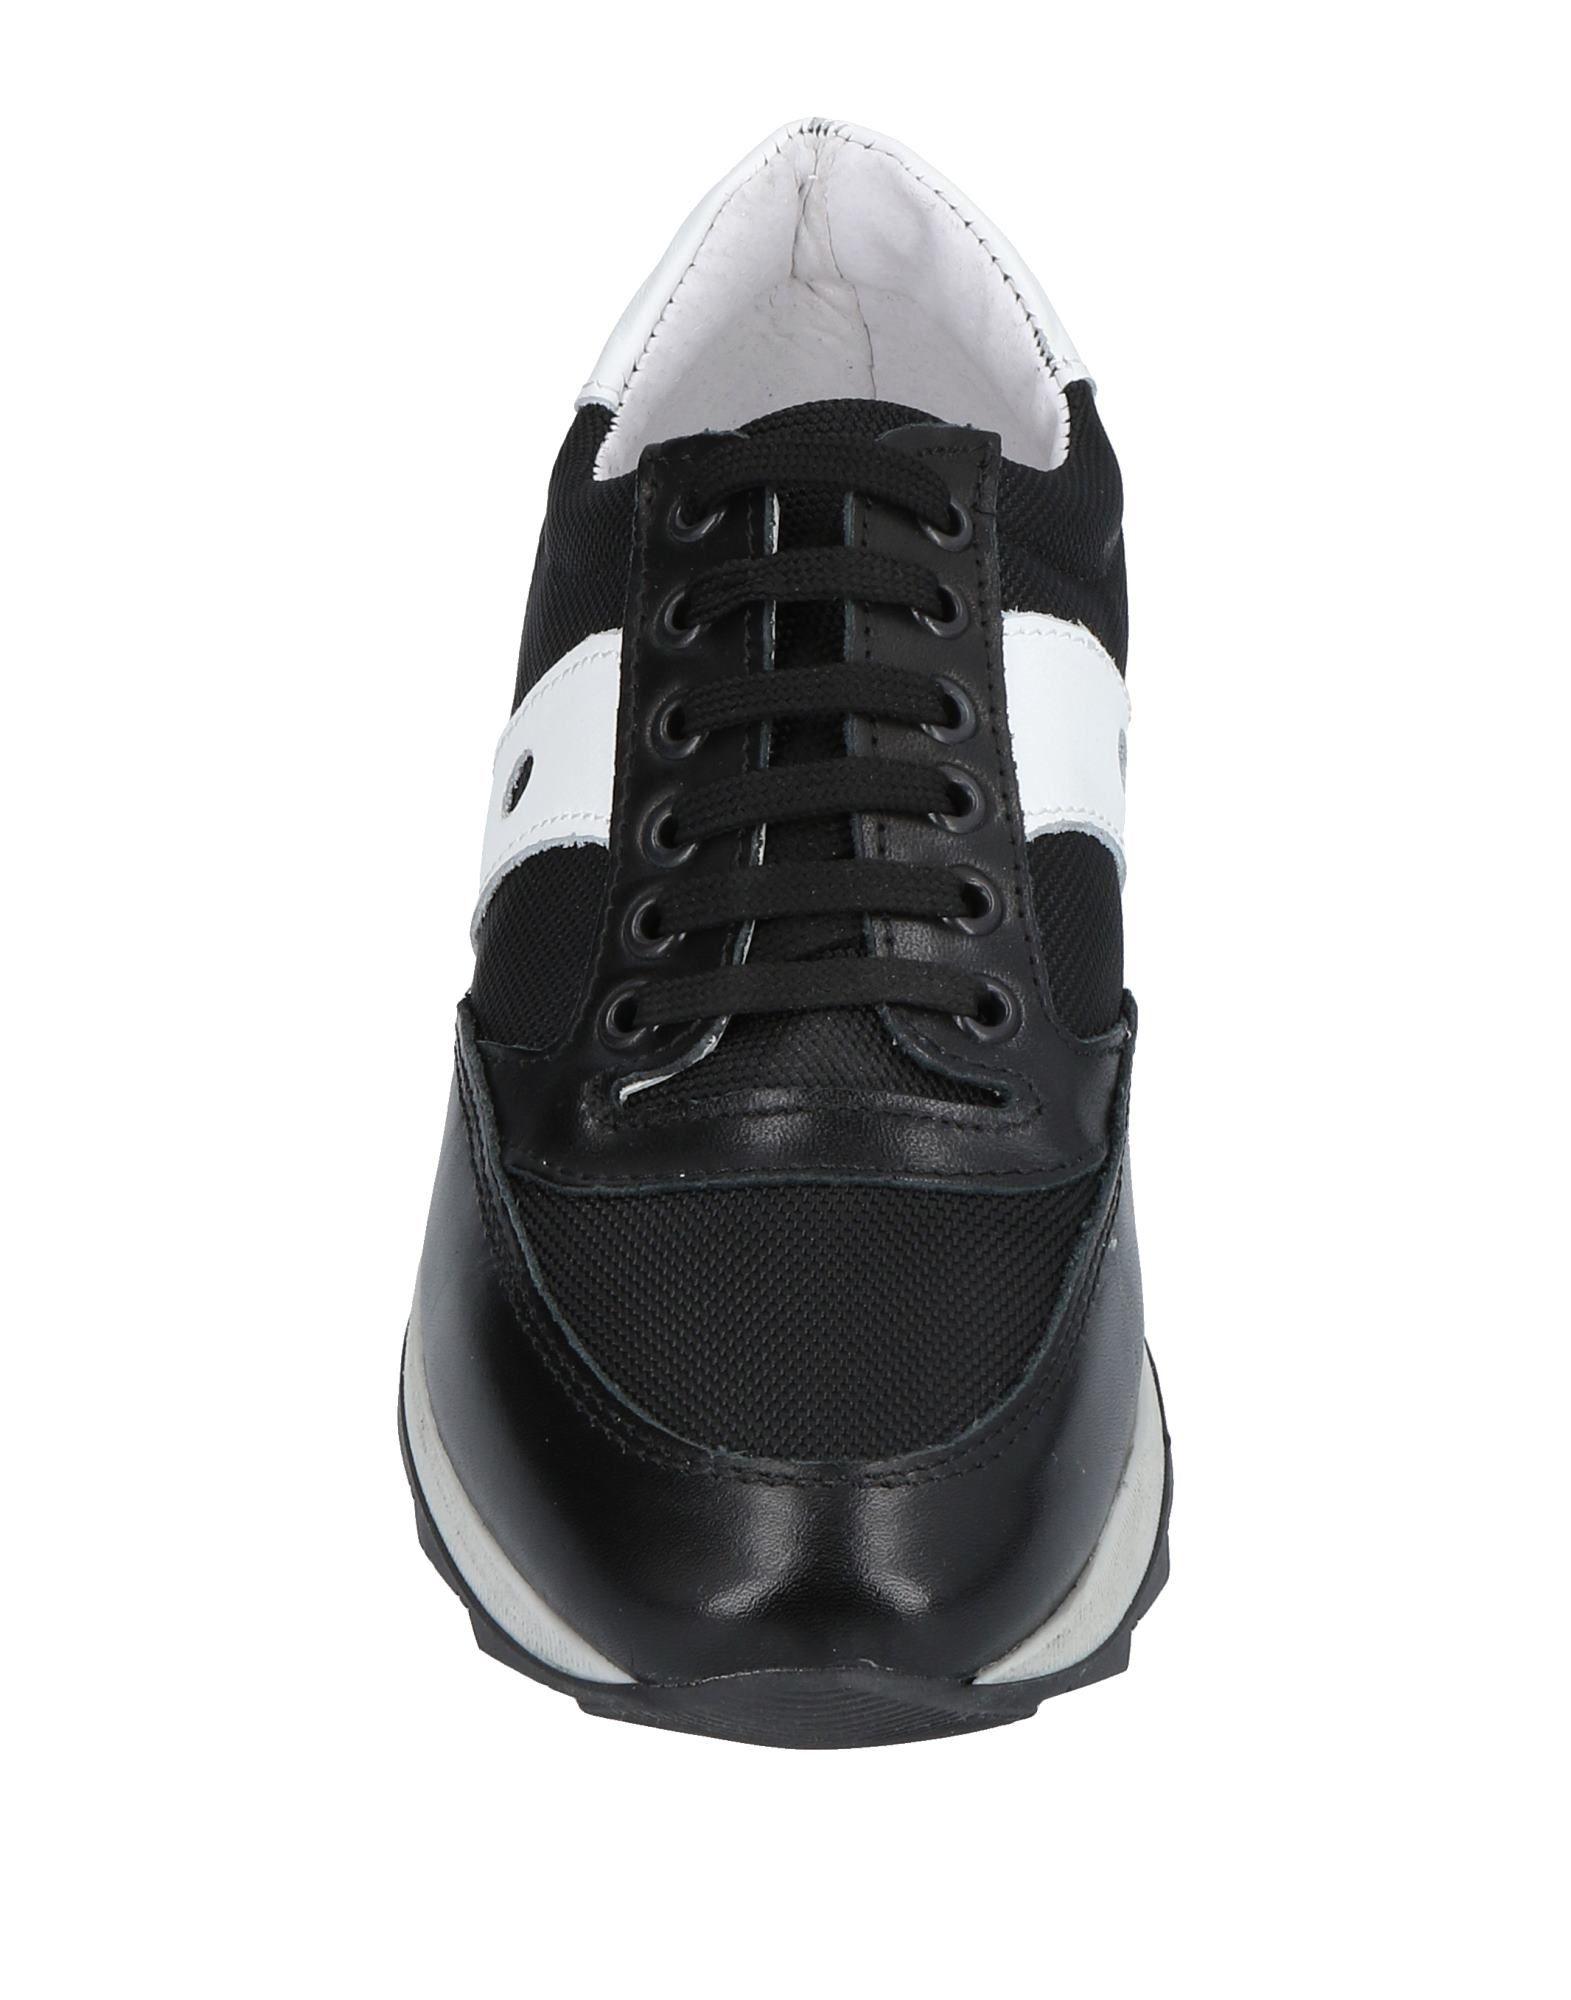 Roberto Della Croce Sneakers Damen  11461867MA Gute Qualität beliebte Schuhe